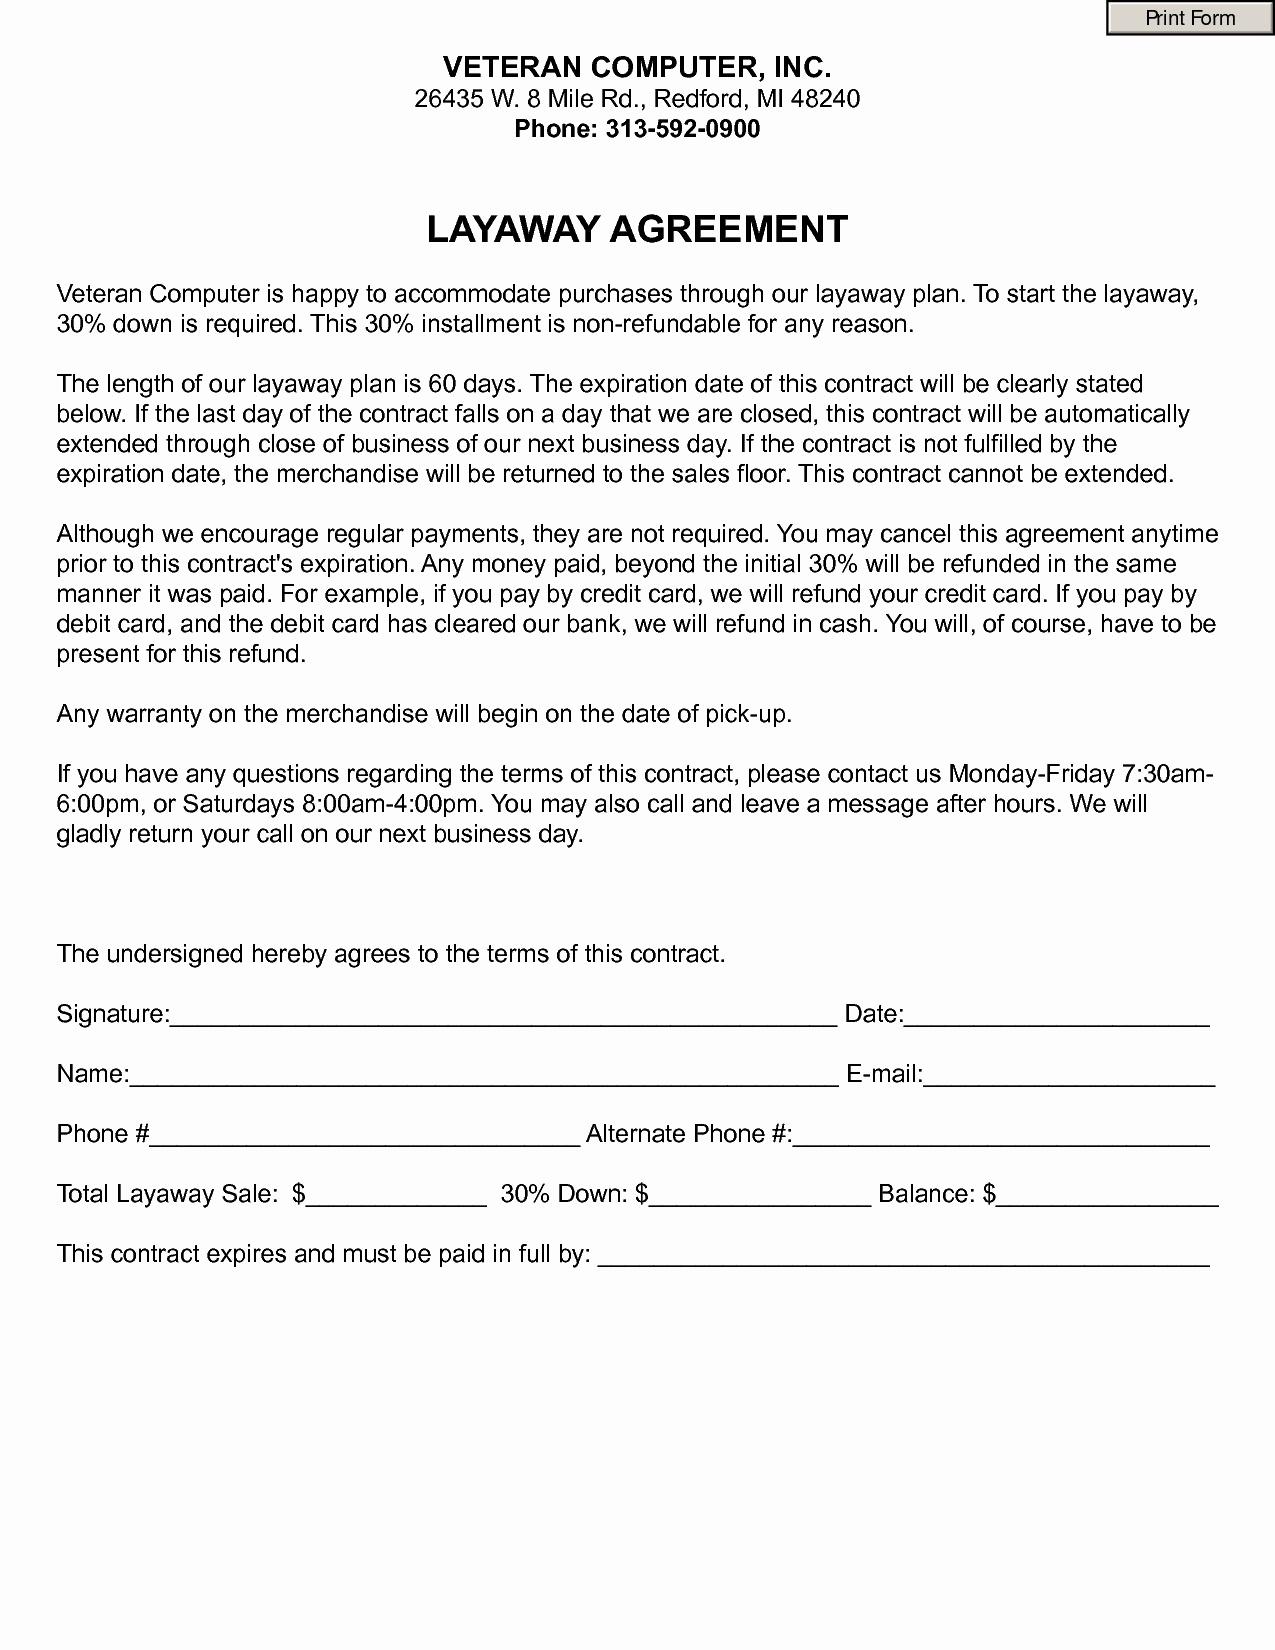 Free Printable Layaway Forms - Tduck.ca - Free Printable Layaway Forms